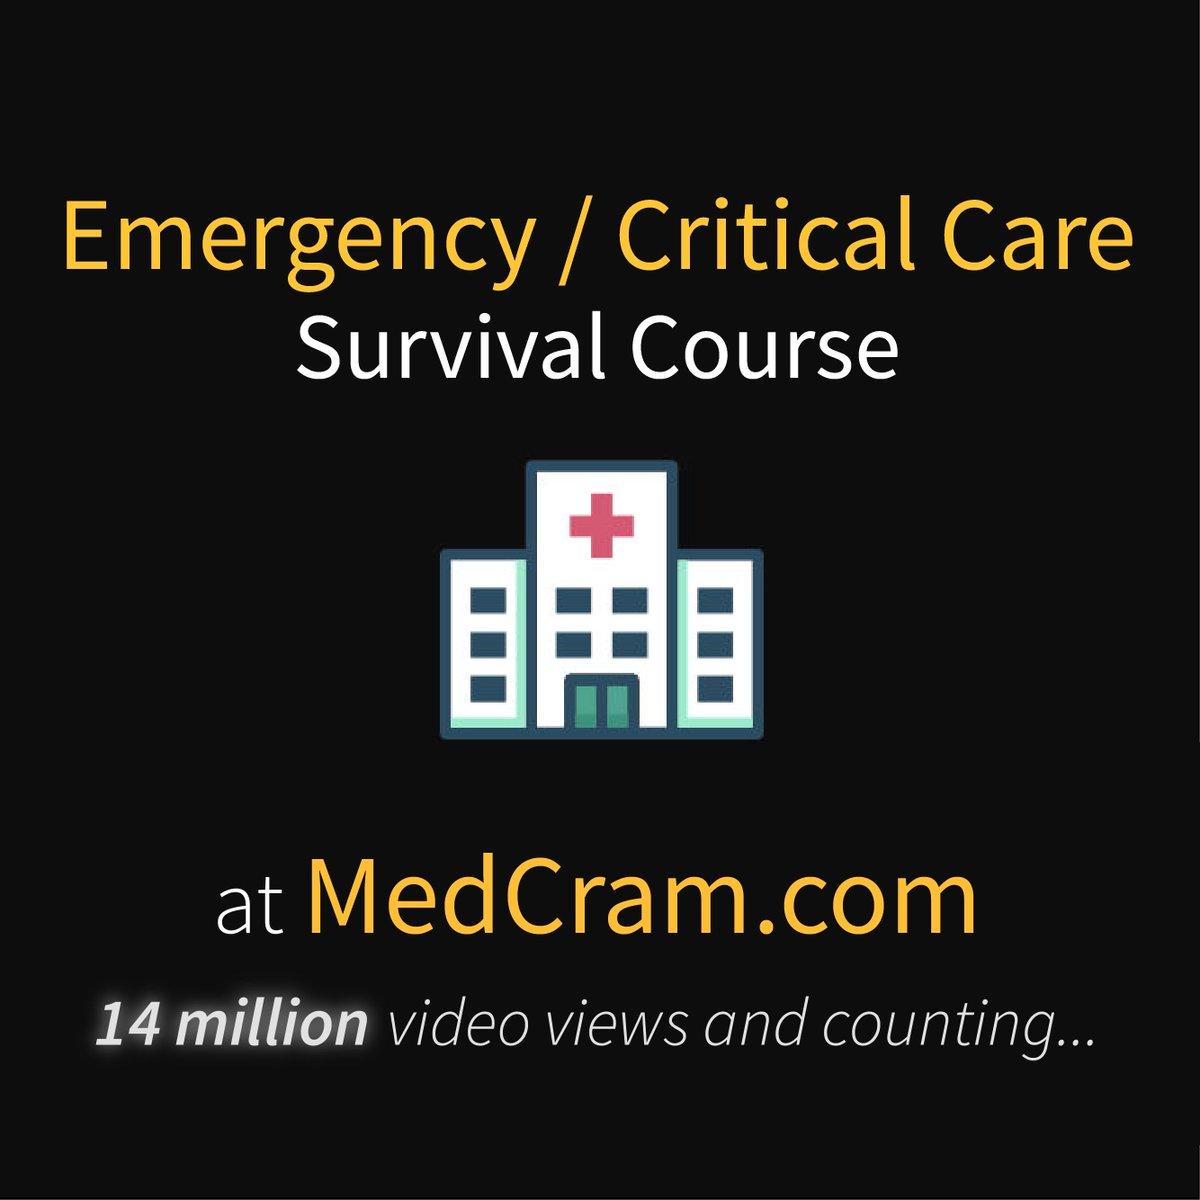 MedCram on Twitter: